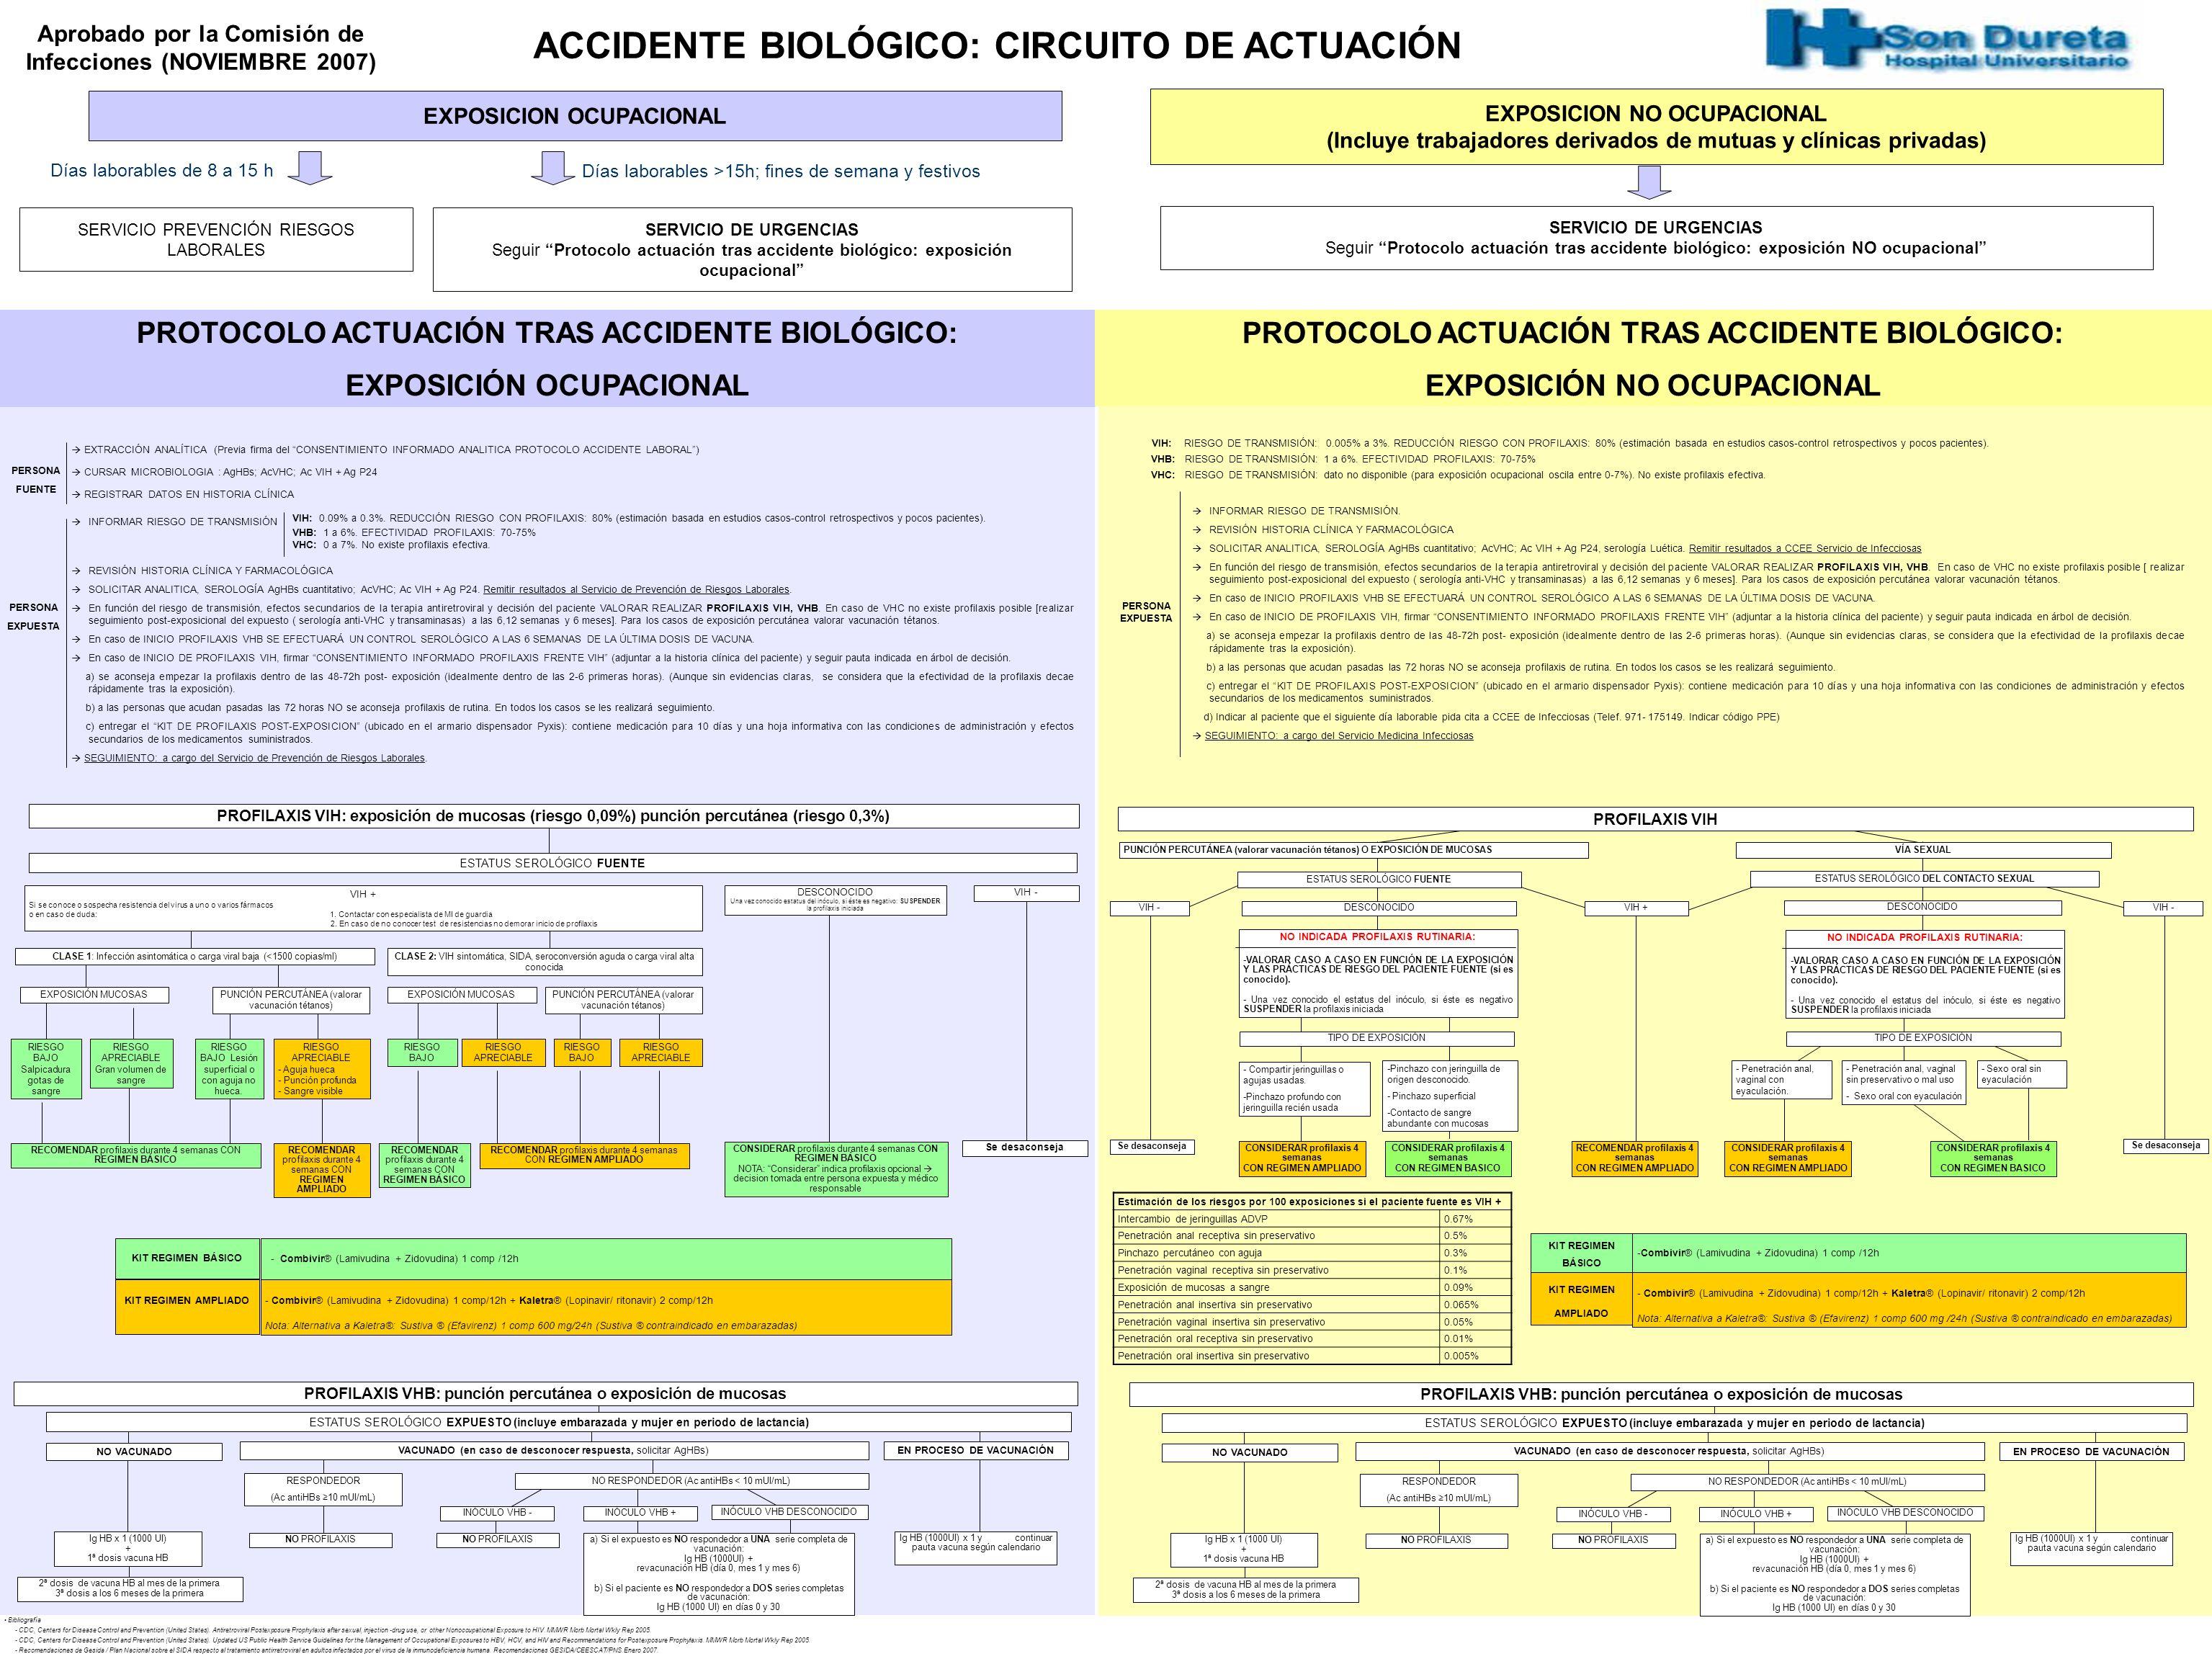 ACCIDENTE BIOLÓGICO: CIRCUITO DE ACTUACIÓN